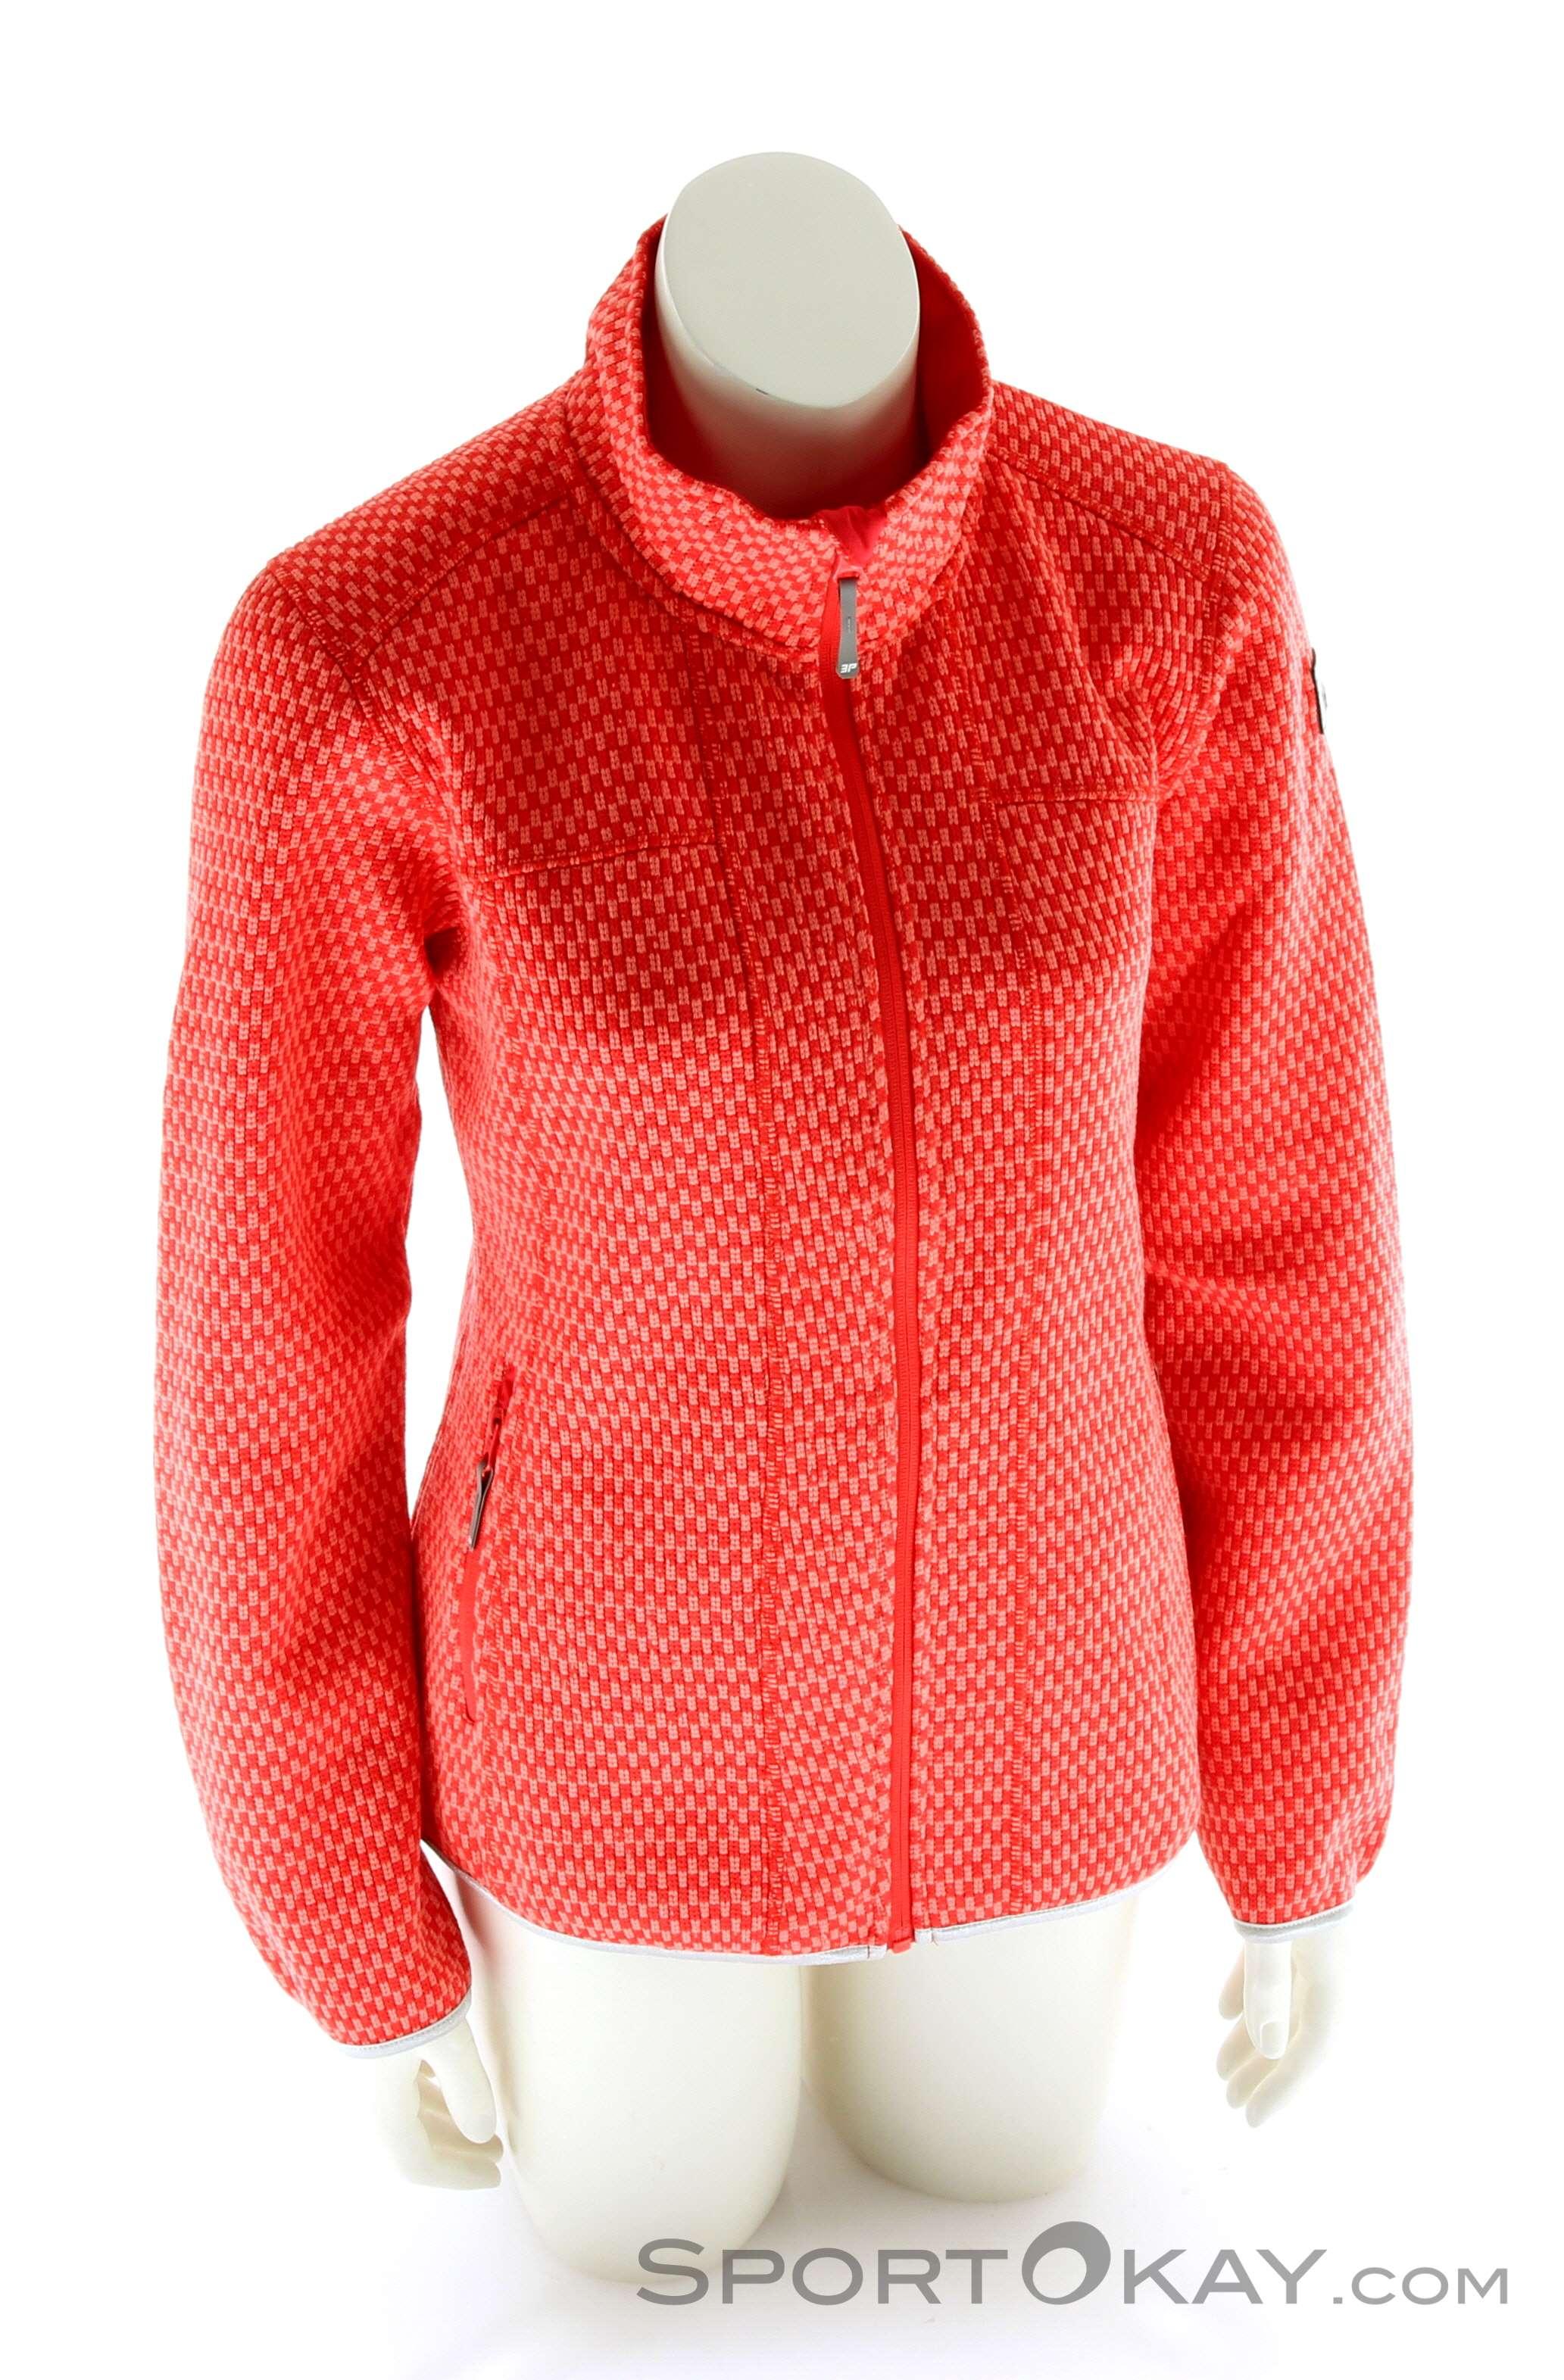 Icepeak FZ Icepeak Laina Damen Outdoorsweater 9IEH2eWDY